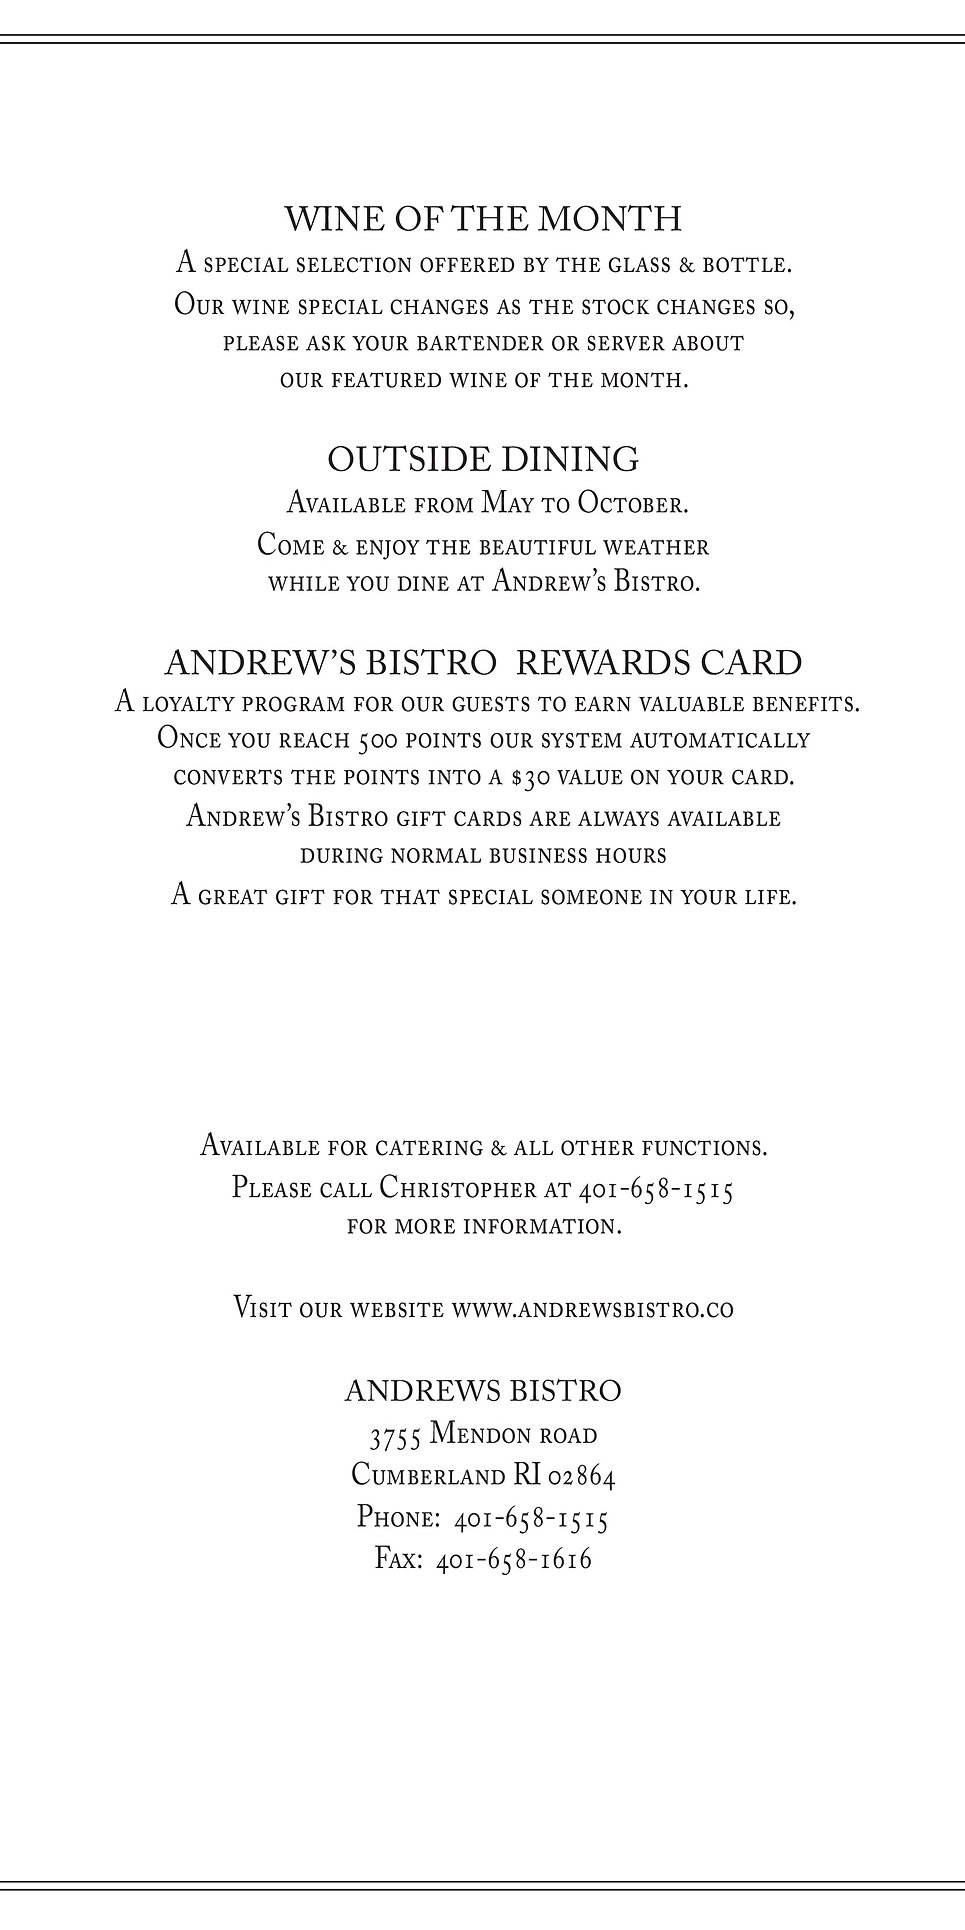 Andrew's Bistro Drink Menu-page-12.jpg